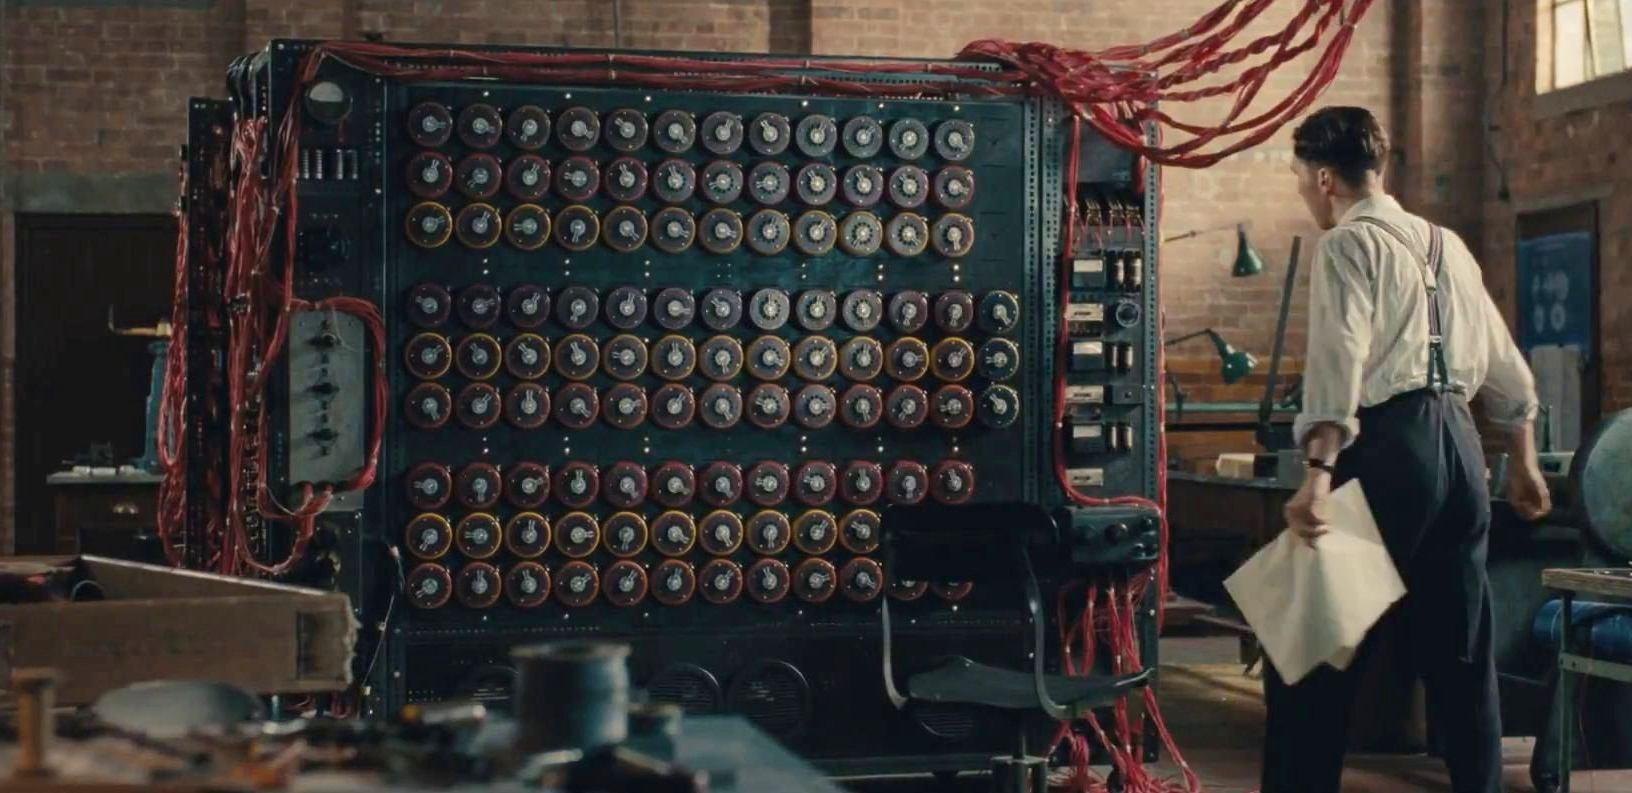 the imitation game - the machine